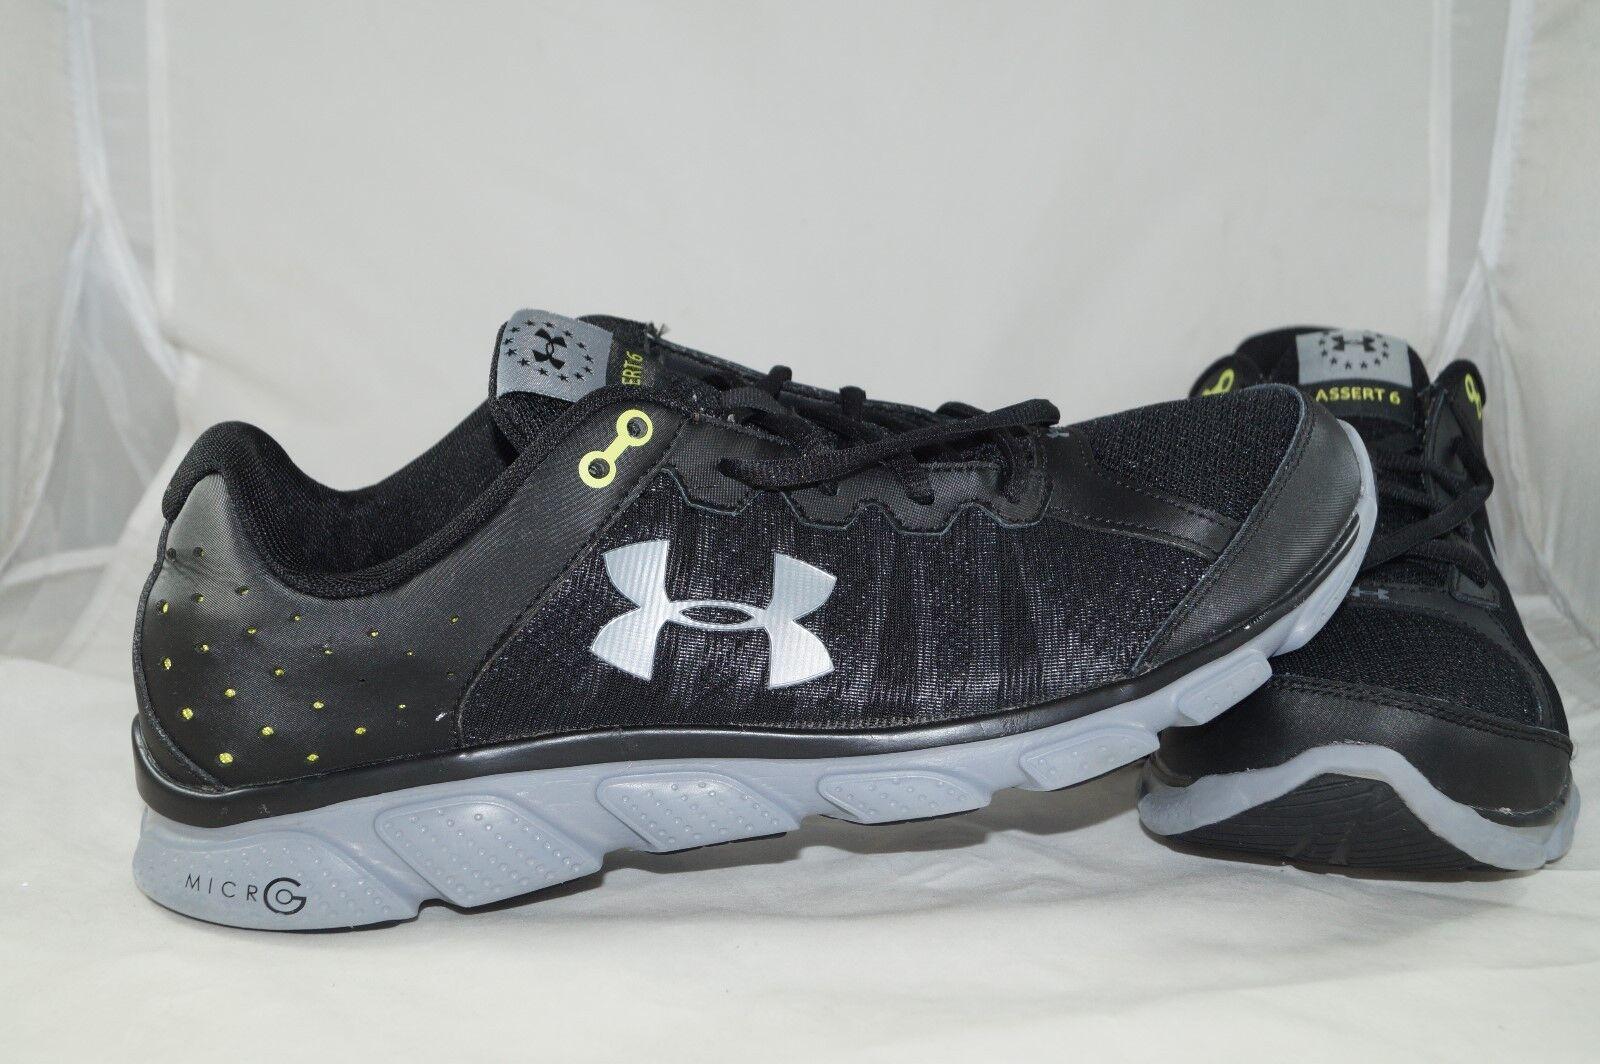 2fa5553970d7c1 Nike Kobe XI Elite Low Easter Size 13 Mens Basketball Basketball Basketball  Shoes Bright Mango 12ea41 ...